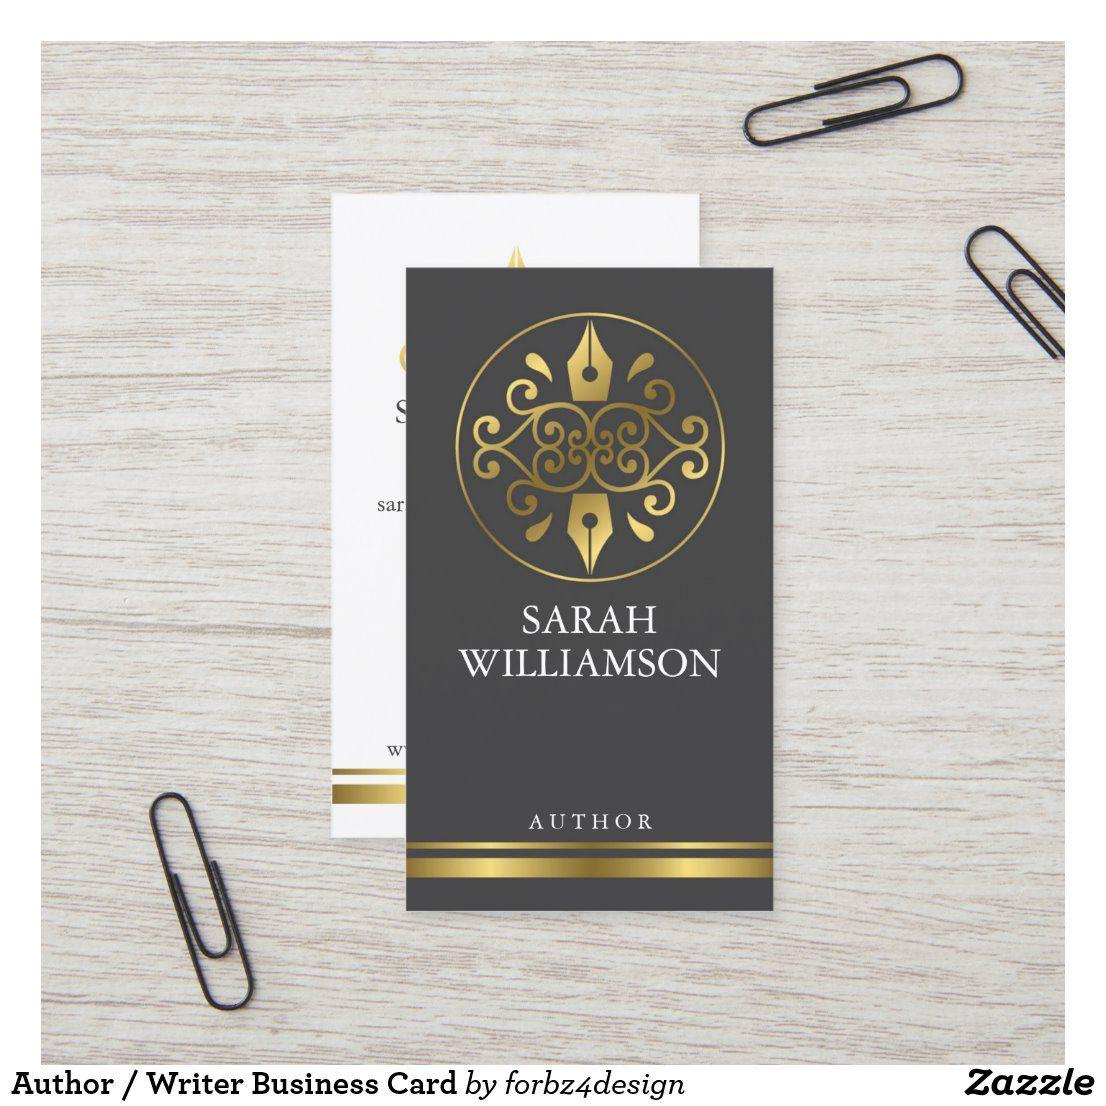 Author / Writer Business Card   Zazzle.com   Writer ...